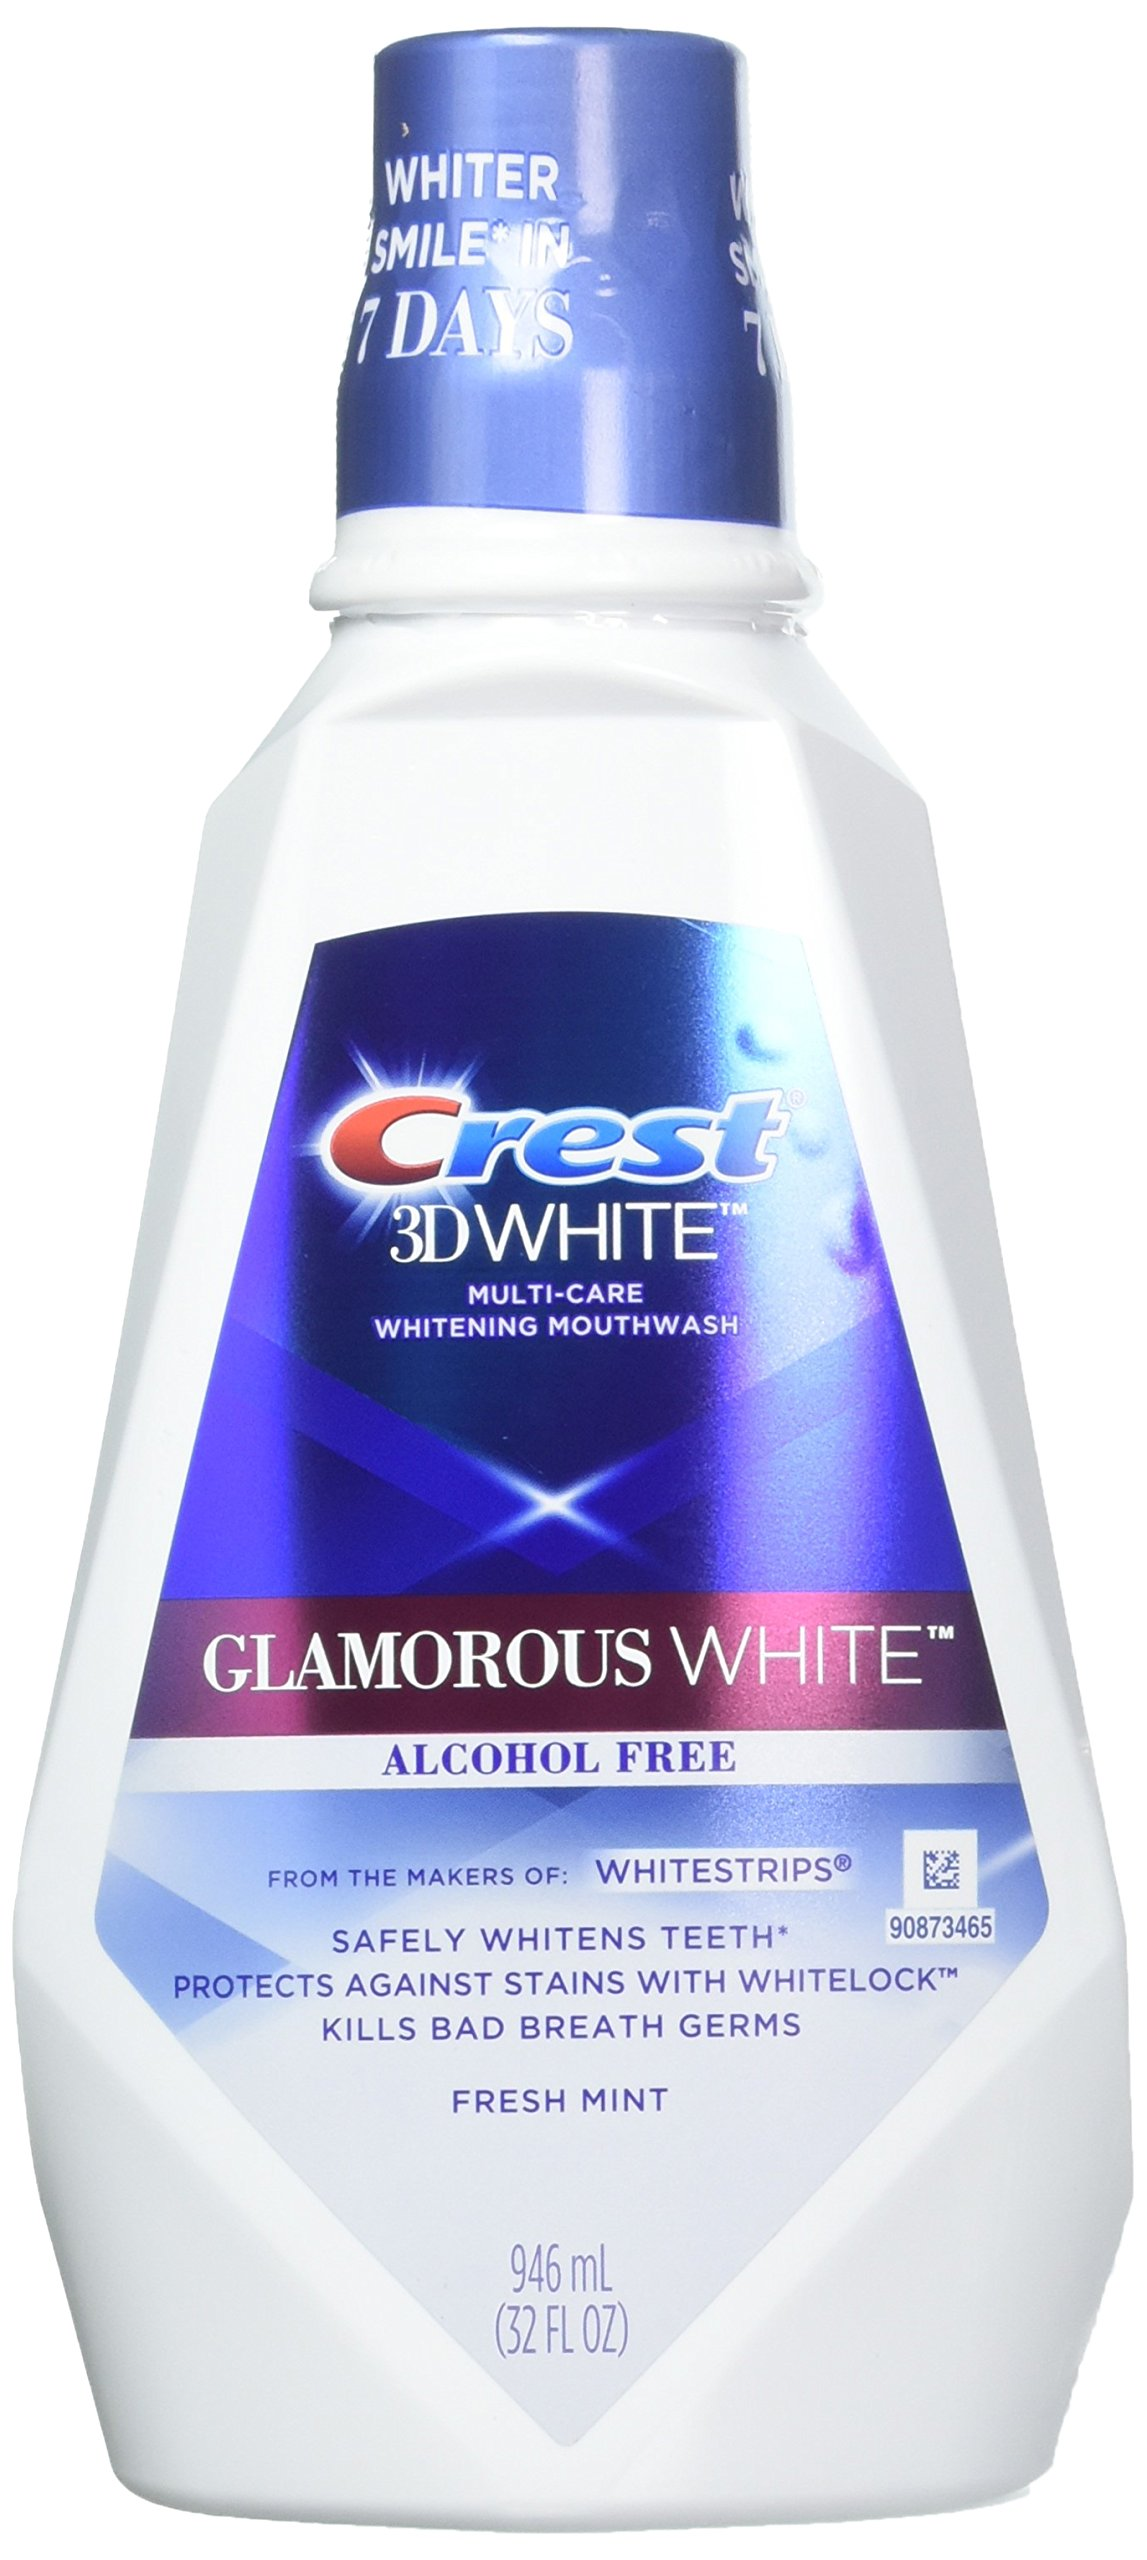 Crest 3D White Multi-Care Whitening Rinse, Glamorous White, Fresh Mint - 32 oz - 2 pk